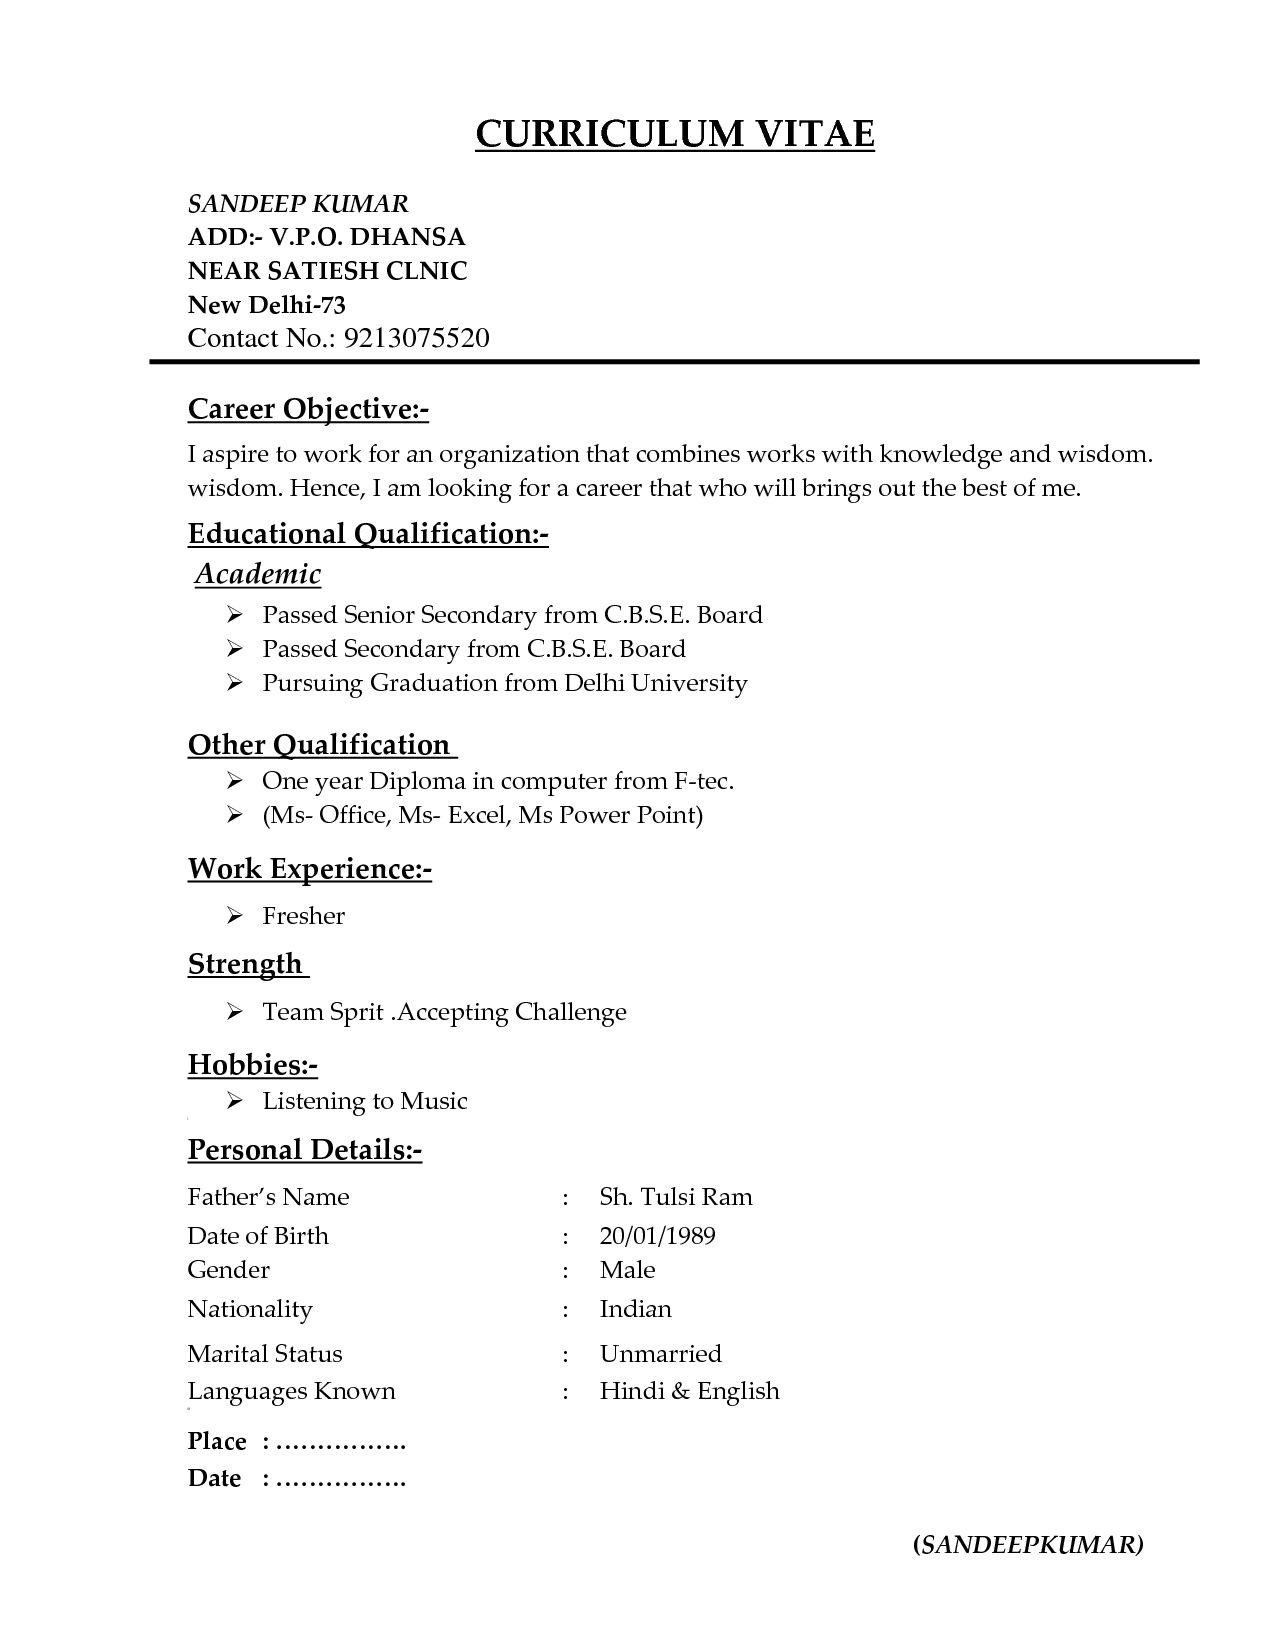 Resume Format For Freshers Pdf